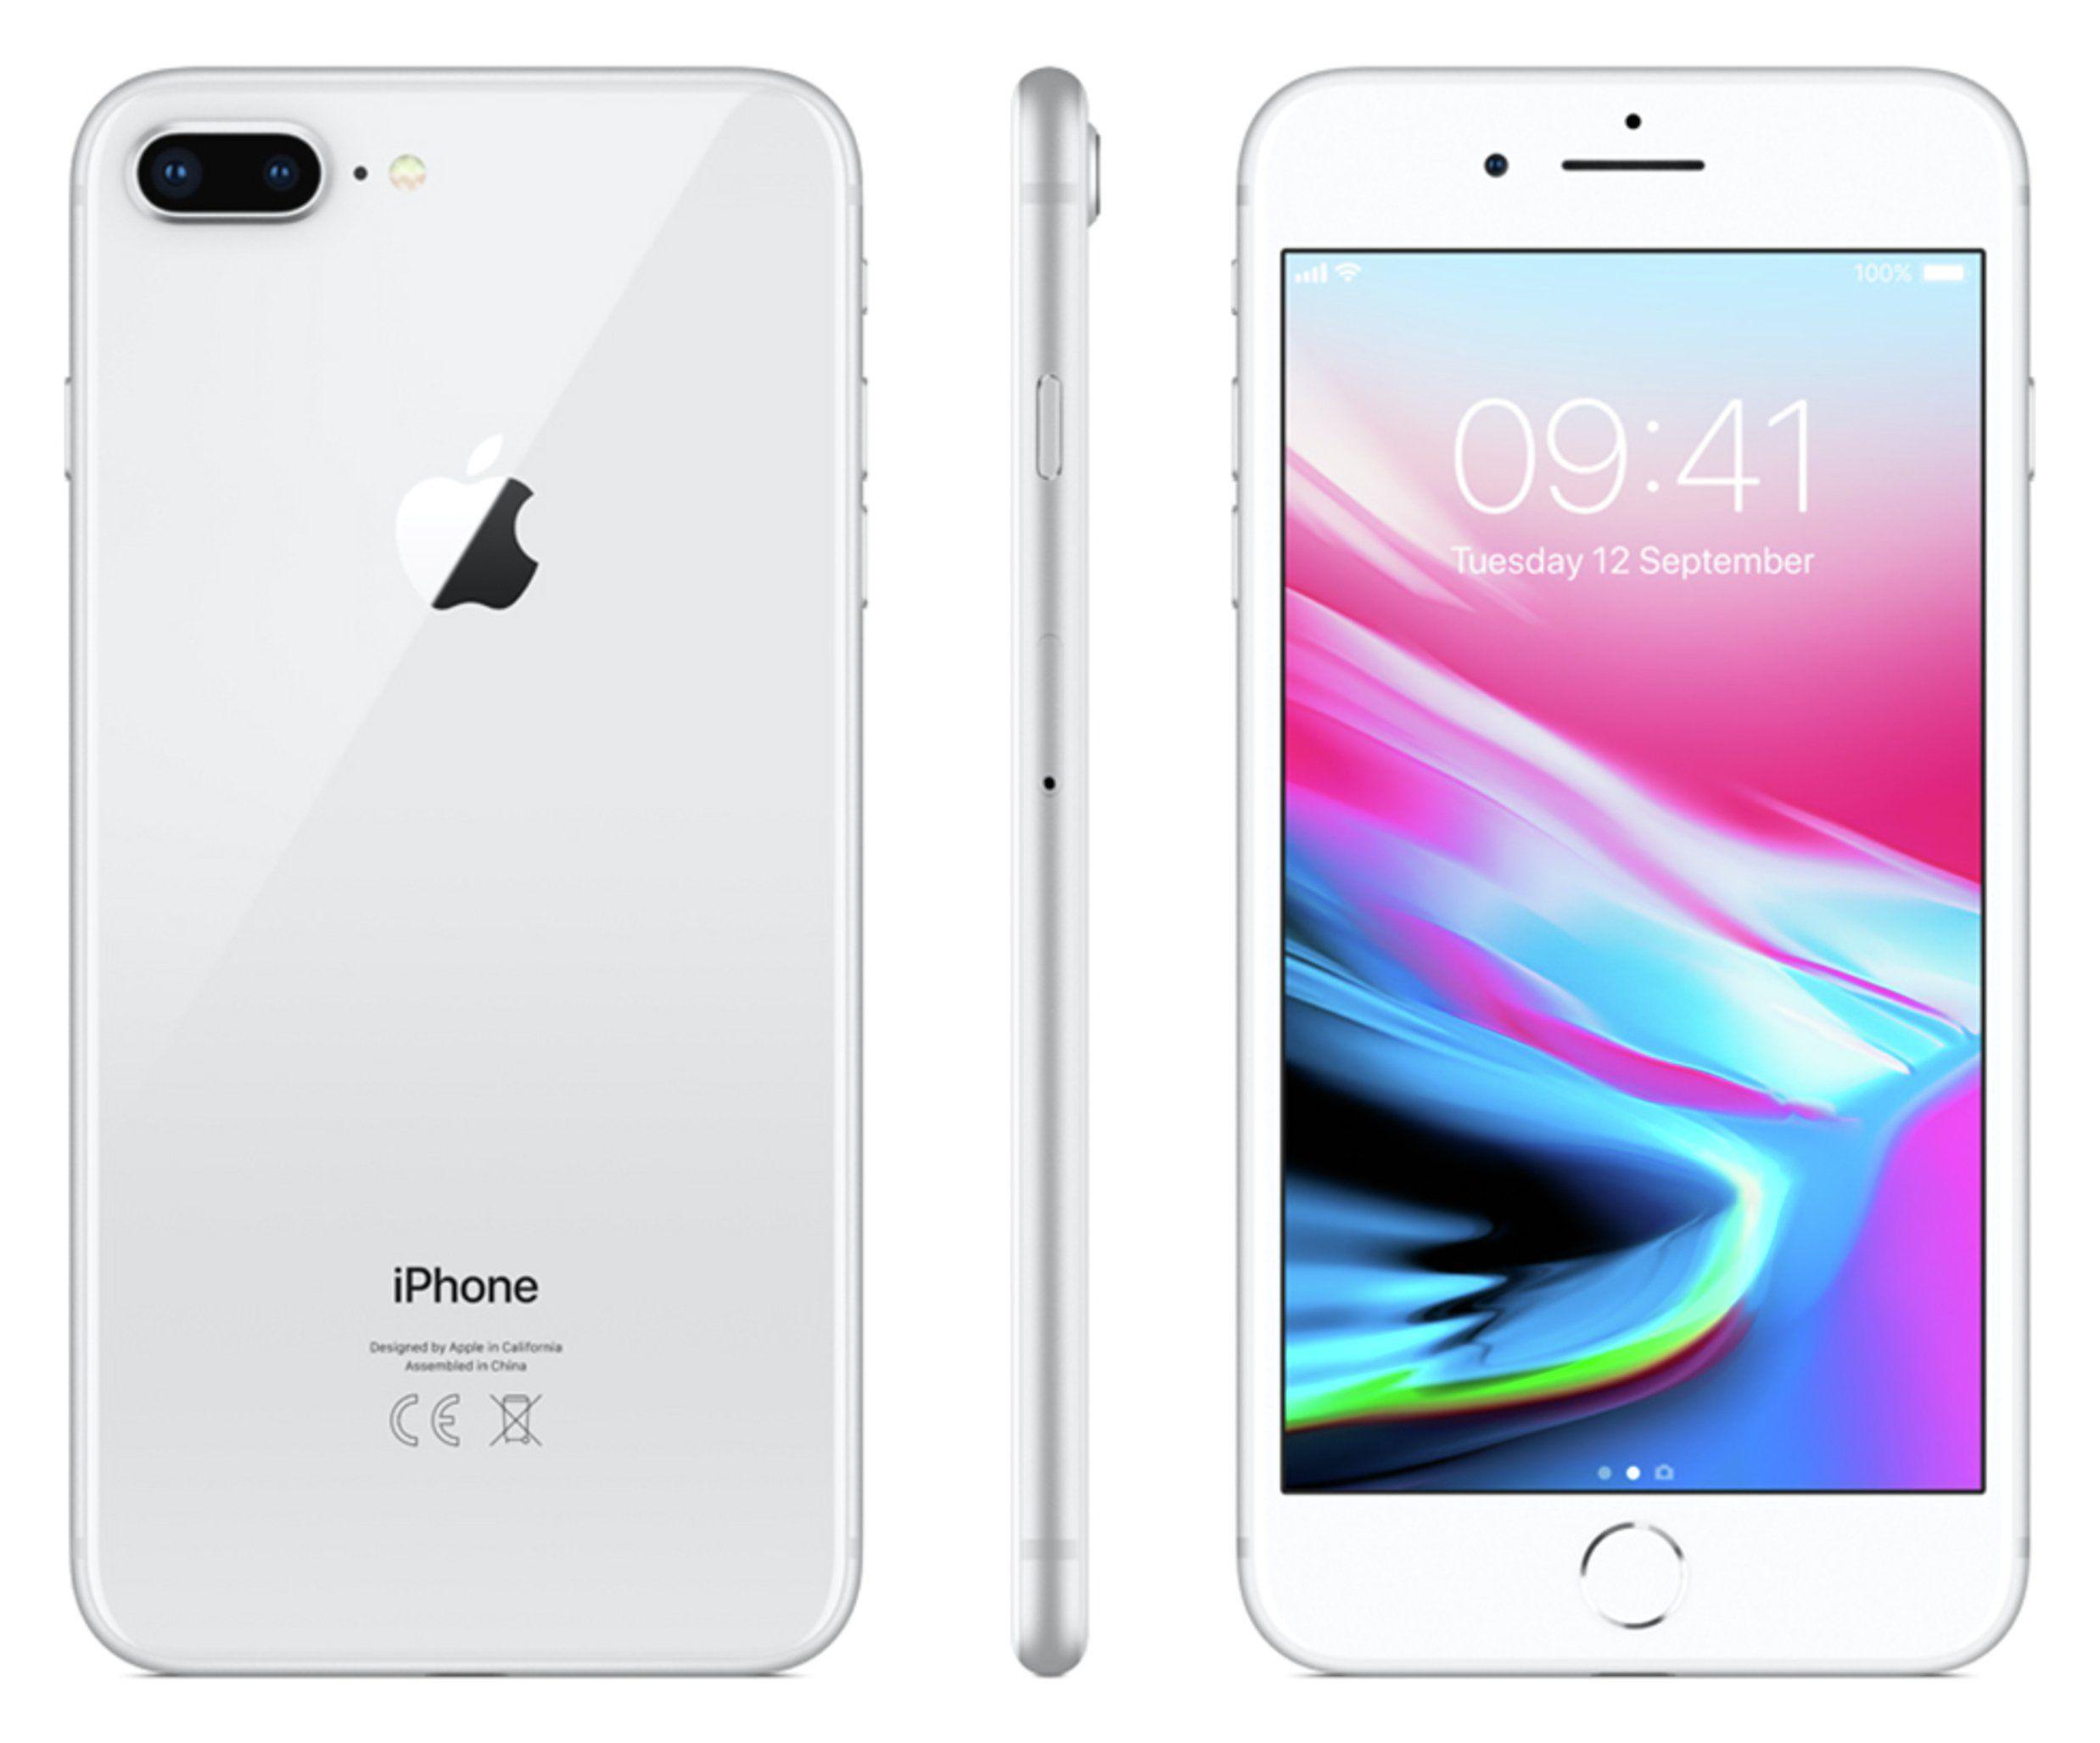 Buy Sim Free Iphone 8 Plus 256gb Mobile Phone Silver Sim Free Phones In 2020 Iphone Iphone 8 Plus T Mobile Phones